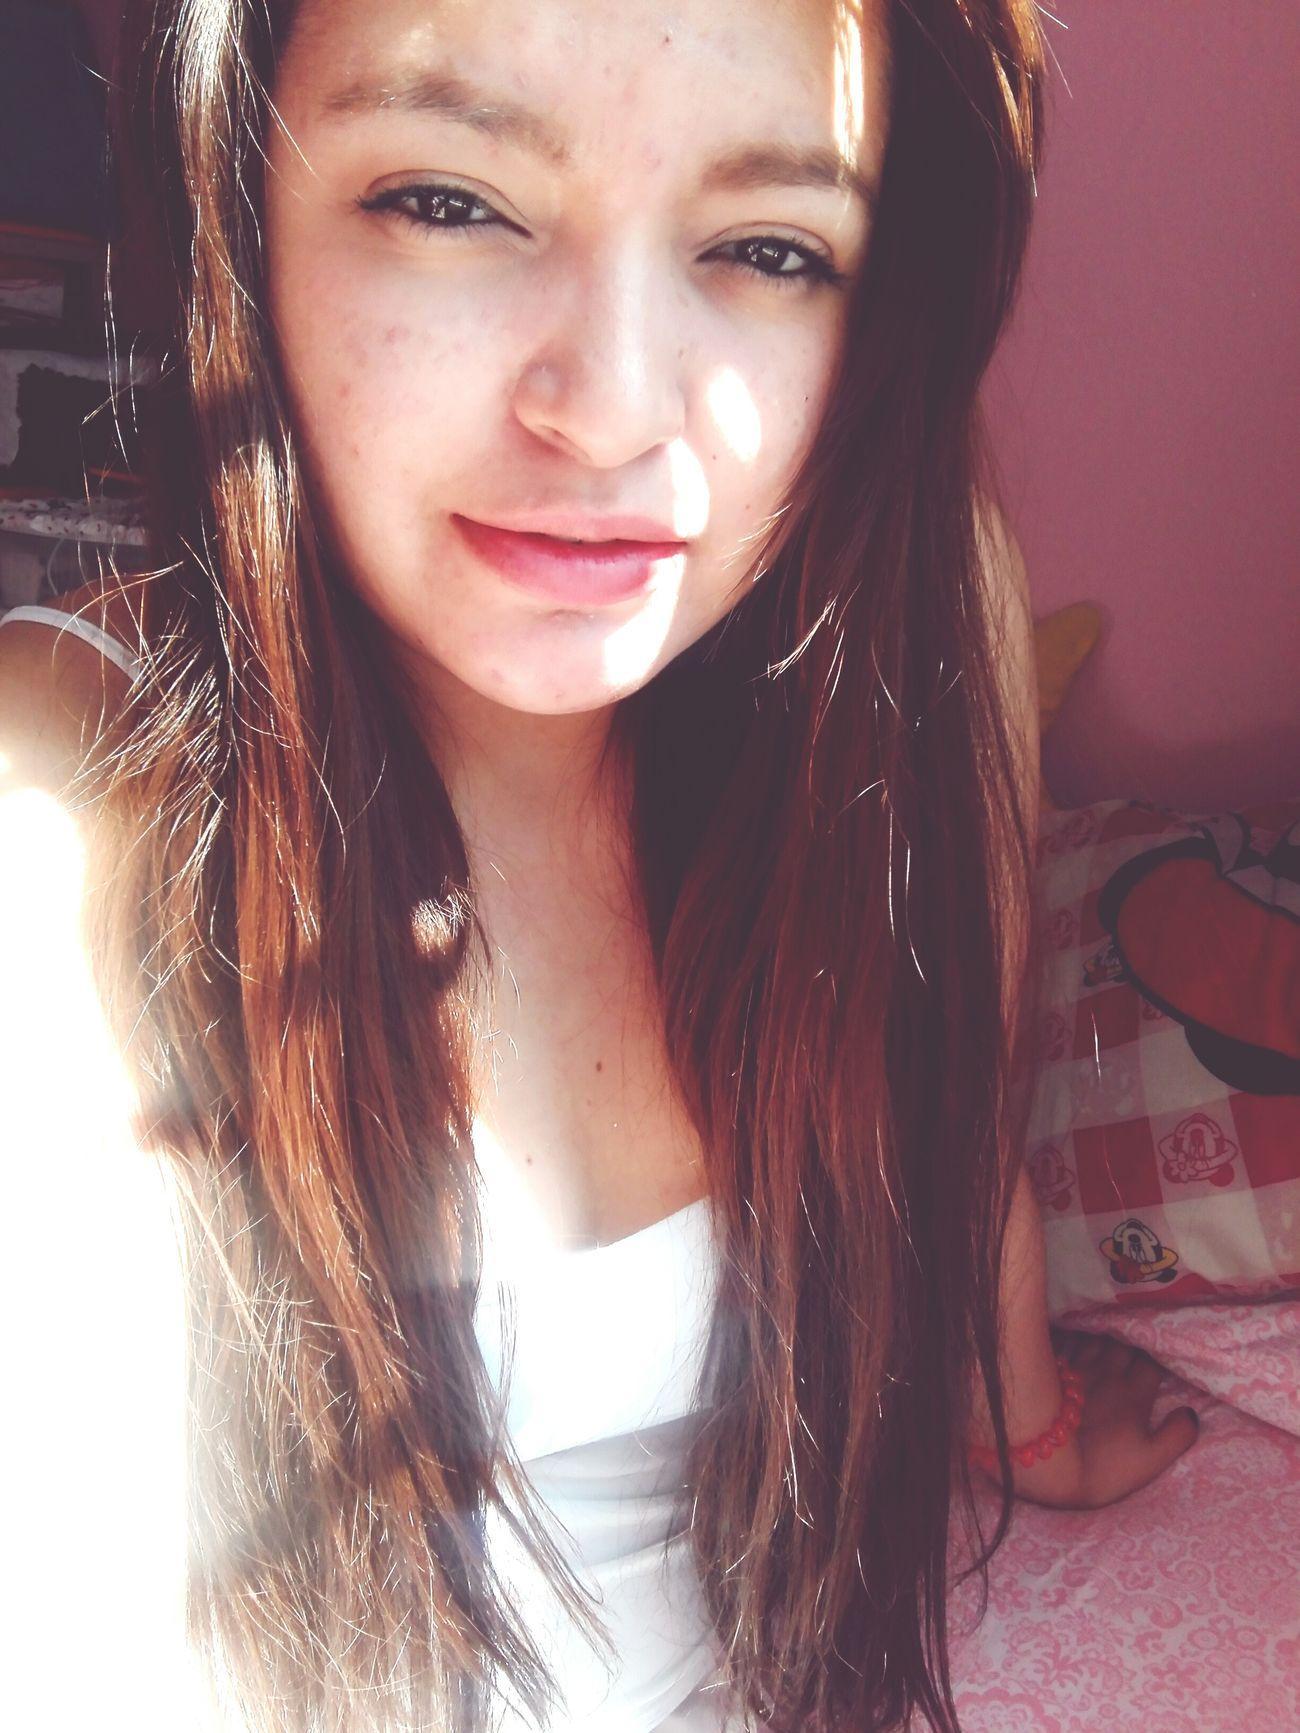 Girl Long Hair Beauty Girls Selfie ✌